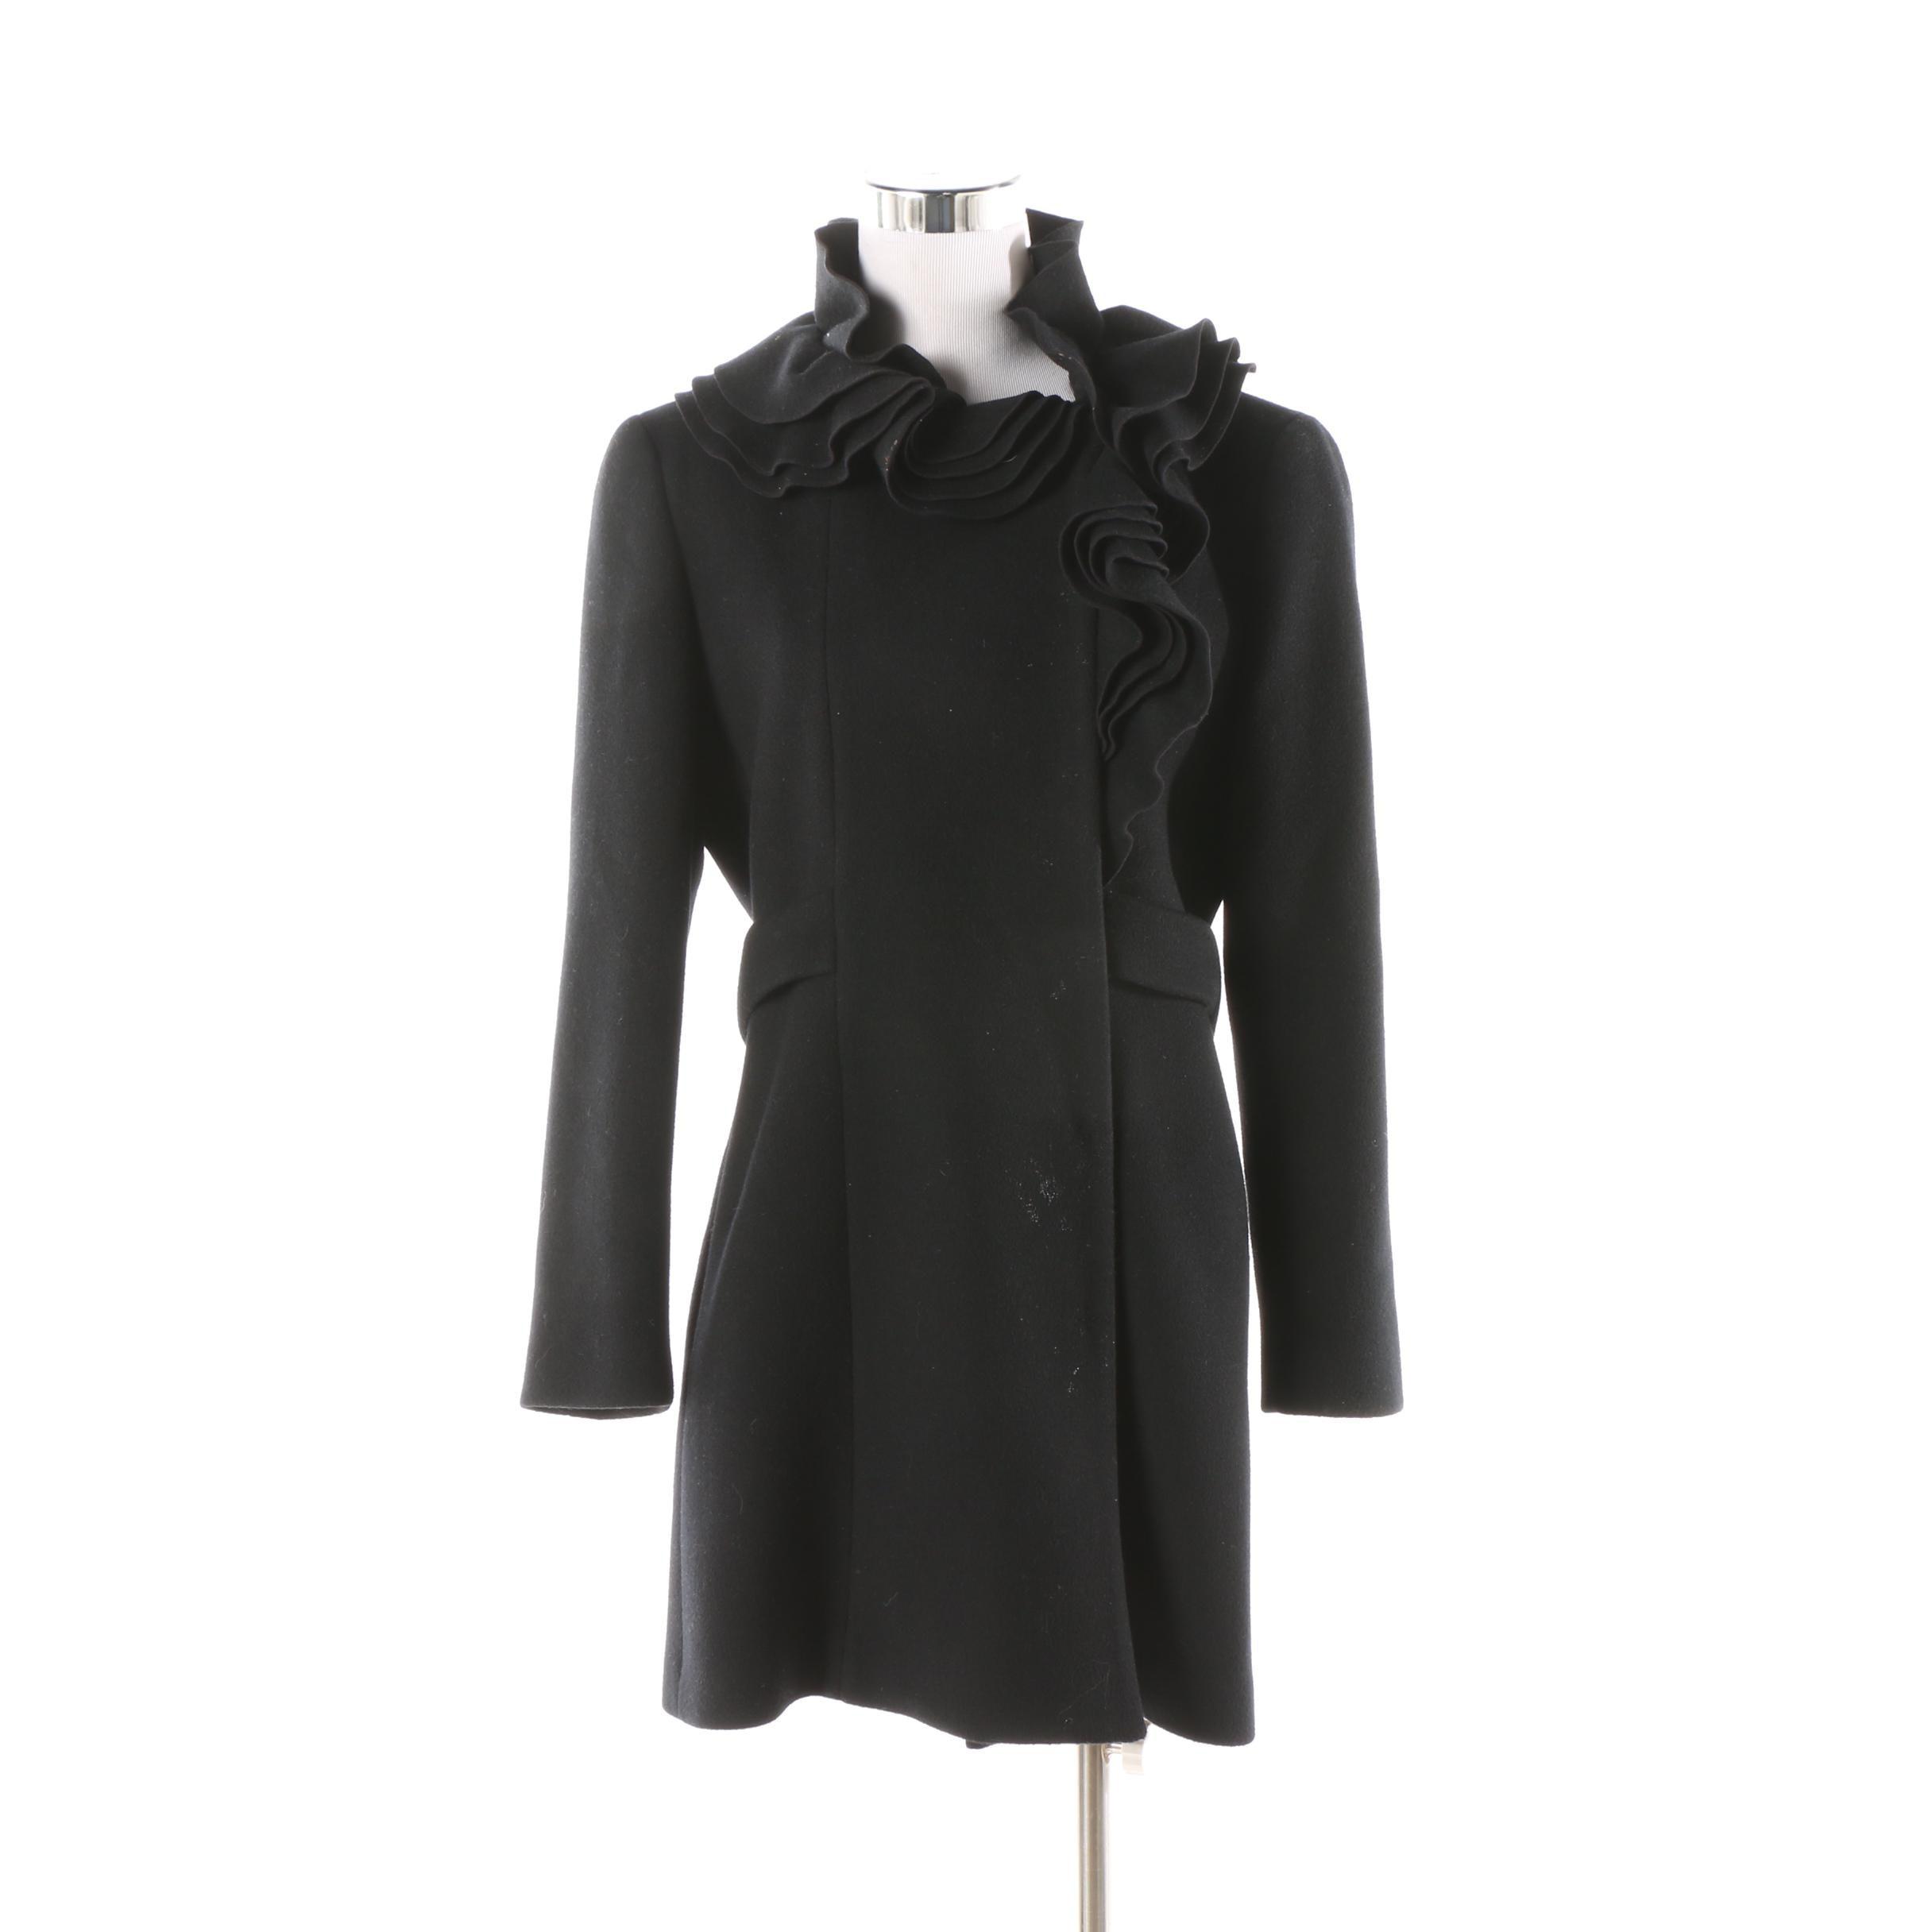 Elie Tahari Ruffle Collar Black Wool Coat